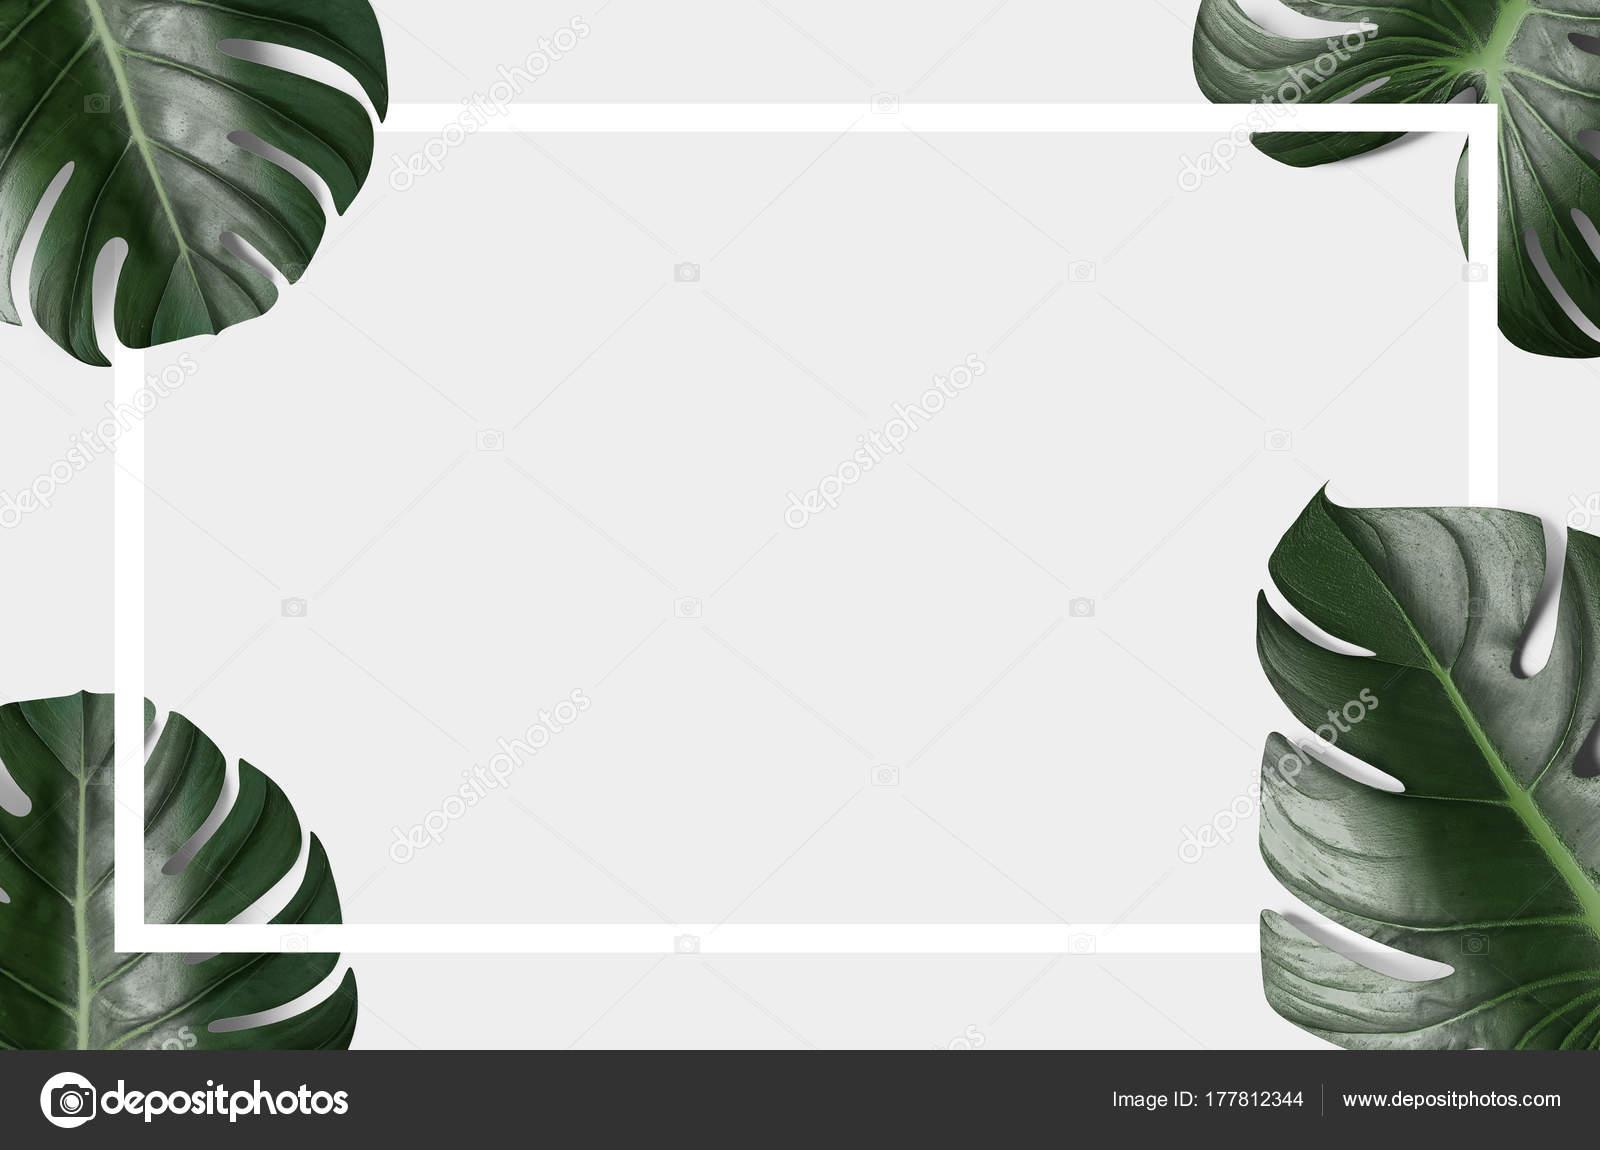 Green Tropical Leaves White Black Frame Light Background Stock Photo C Brocrock 177812344 Find images of tropical leaves. https depositphotos com 177812344 stock photo green tropical leaves white black html